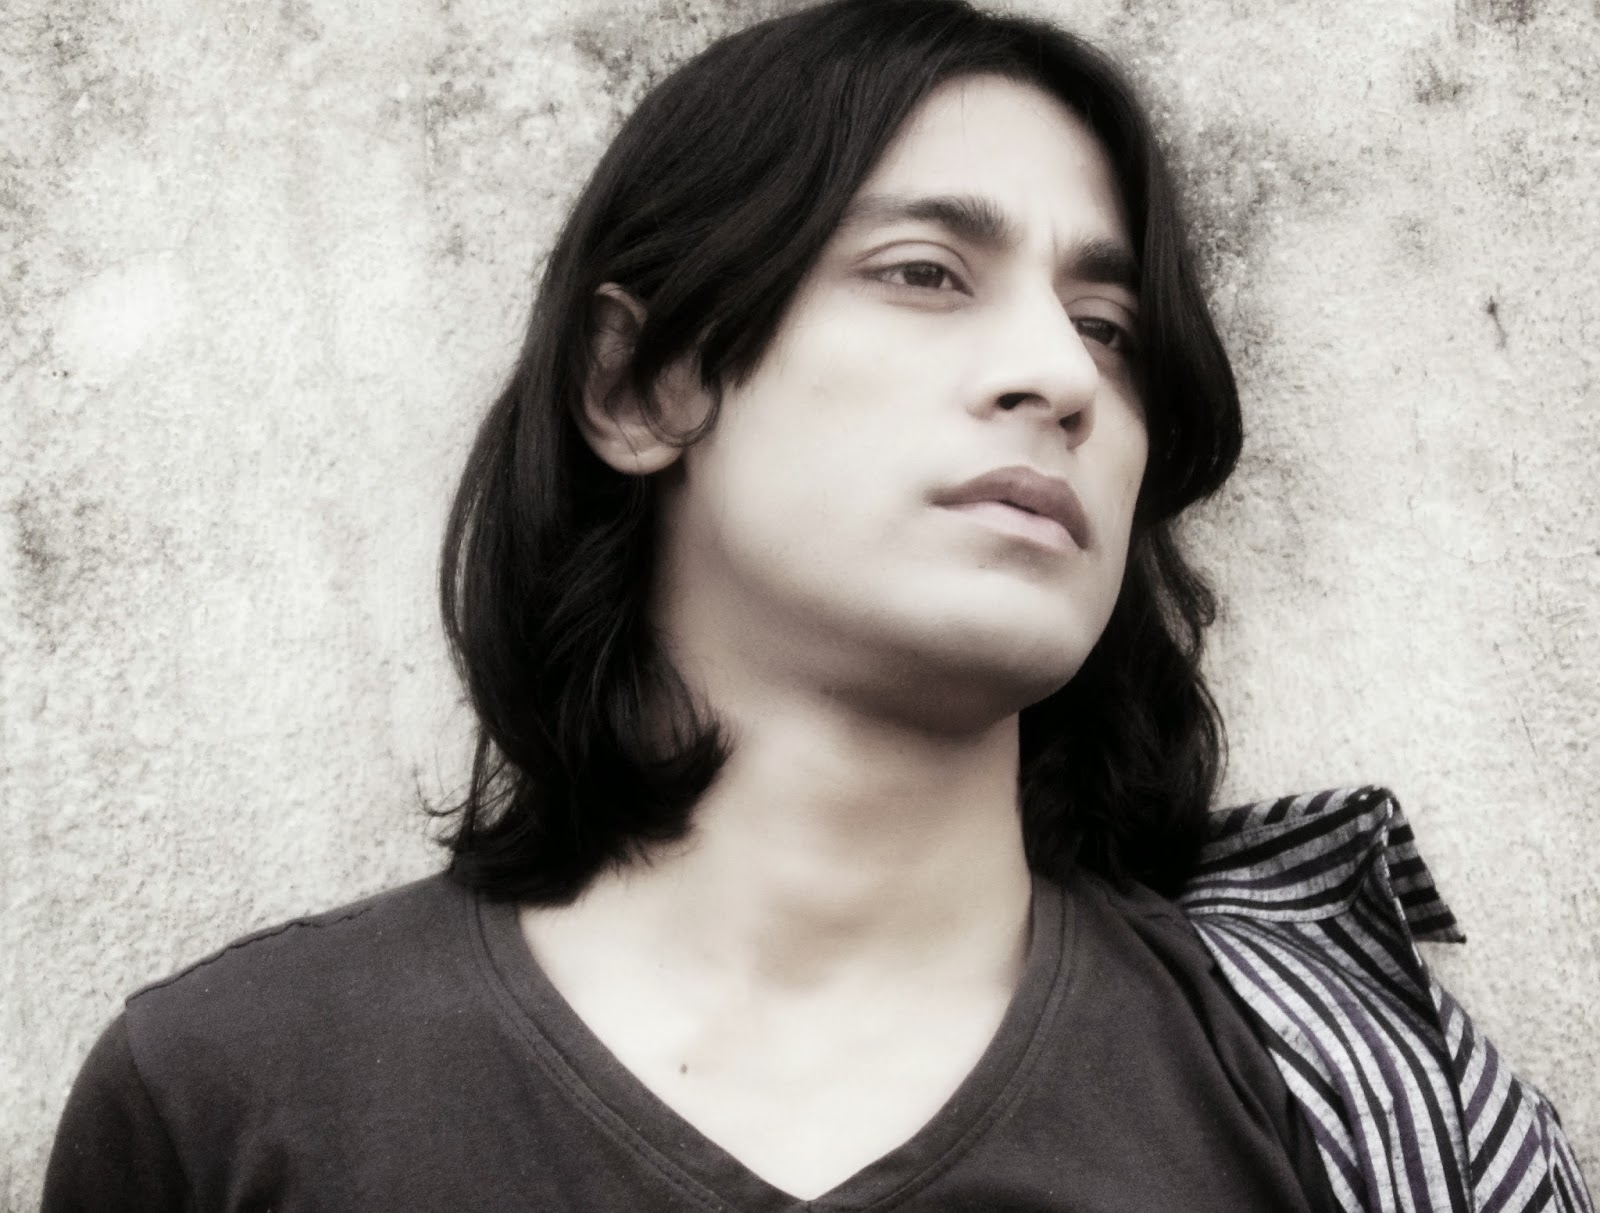 Rajkumar's eye expression by df creation